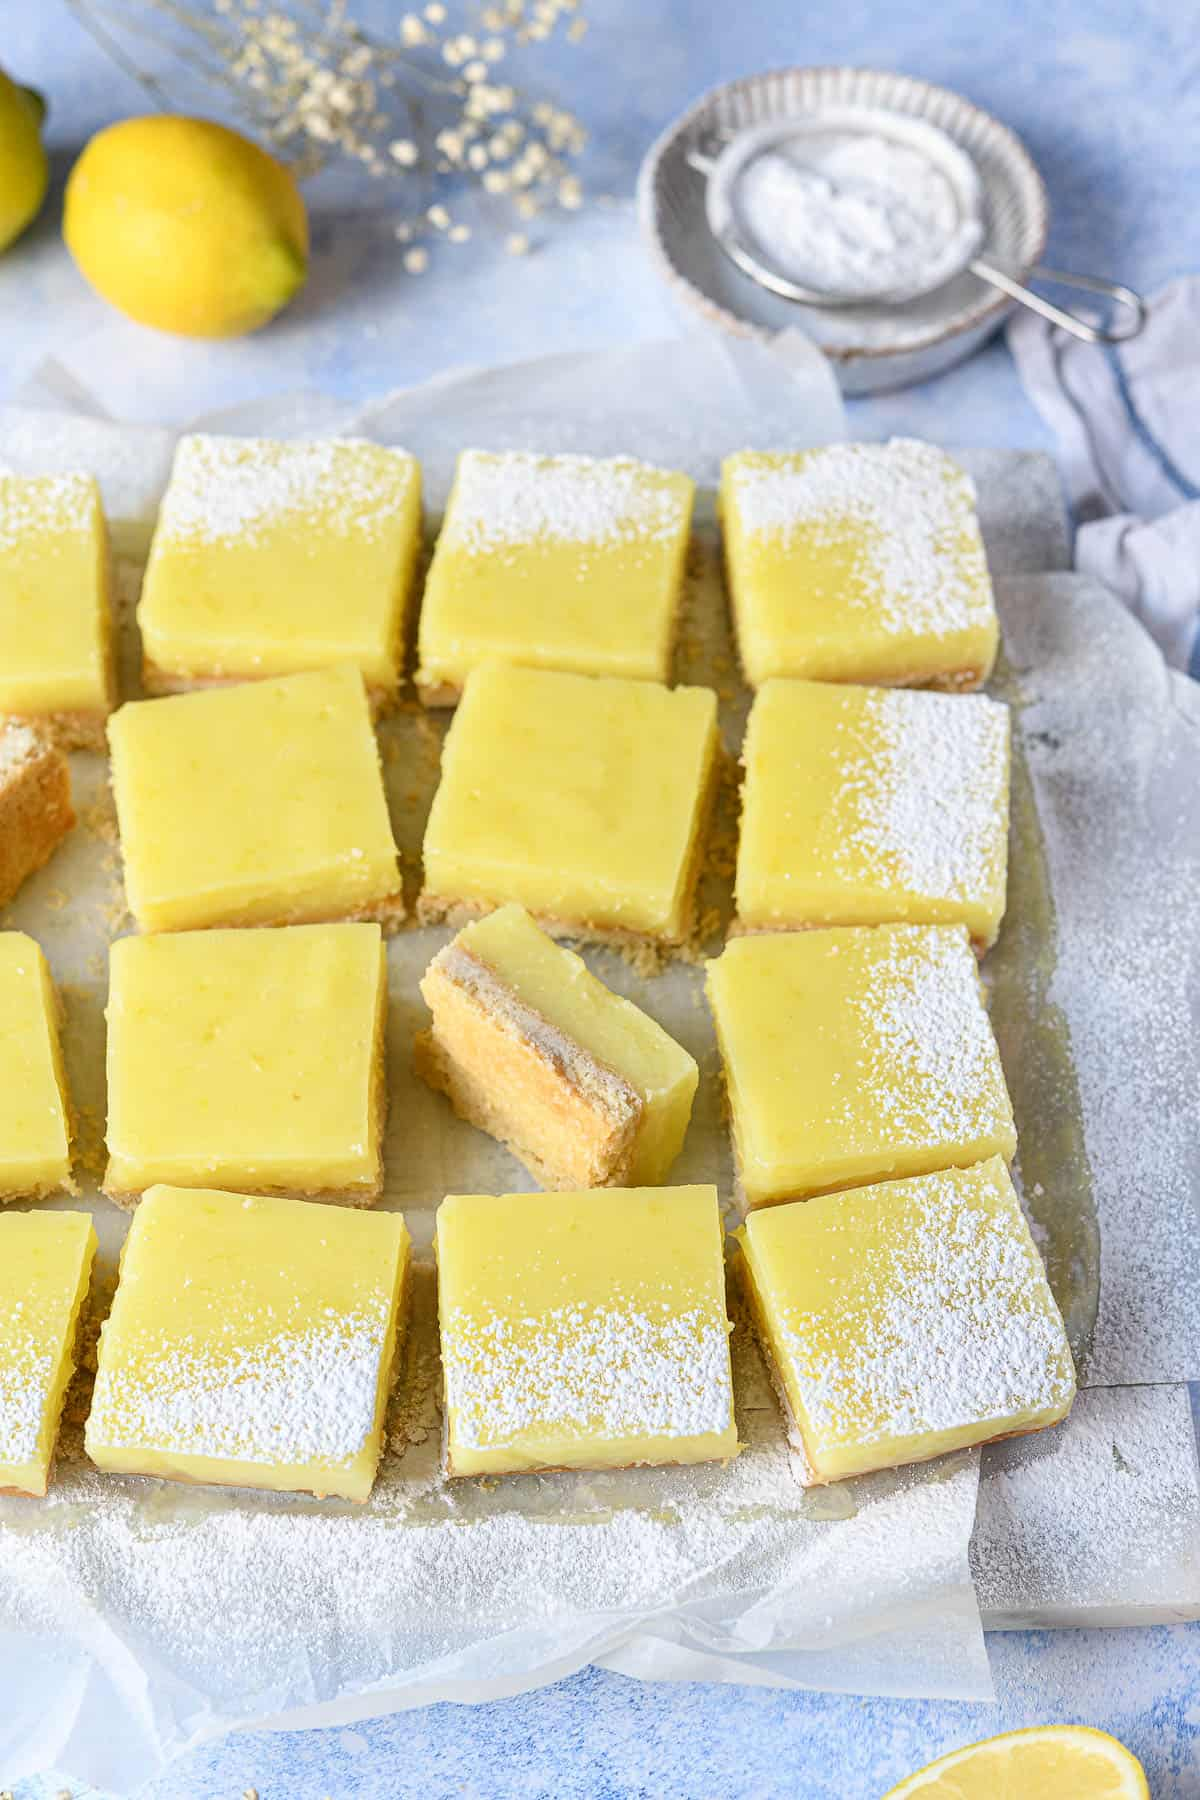 Lemon bars on white baking parchment on a blue surface.